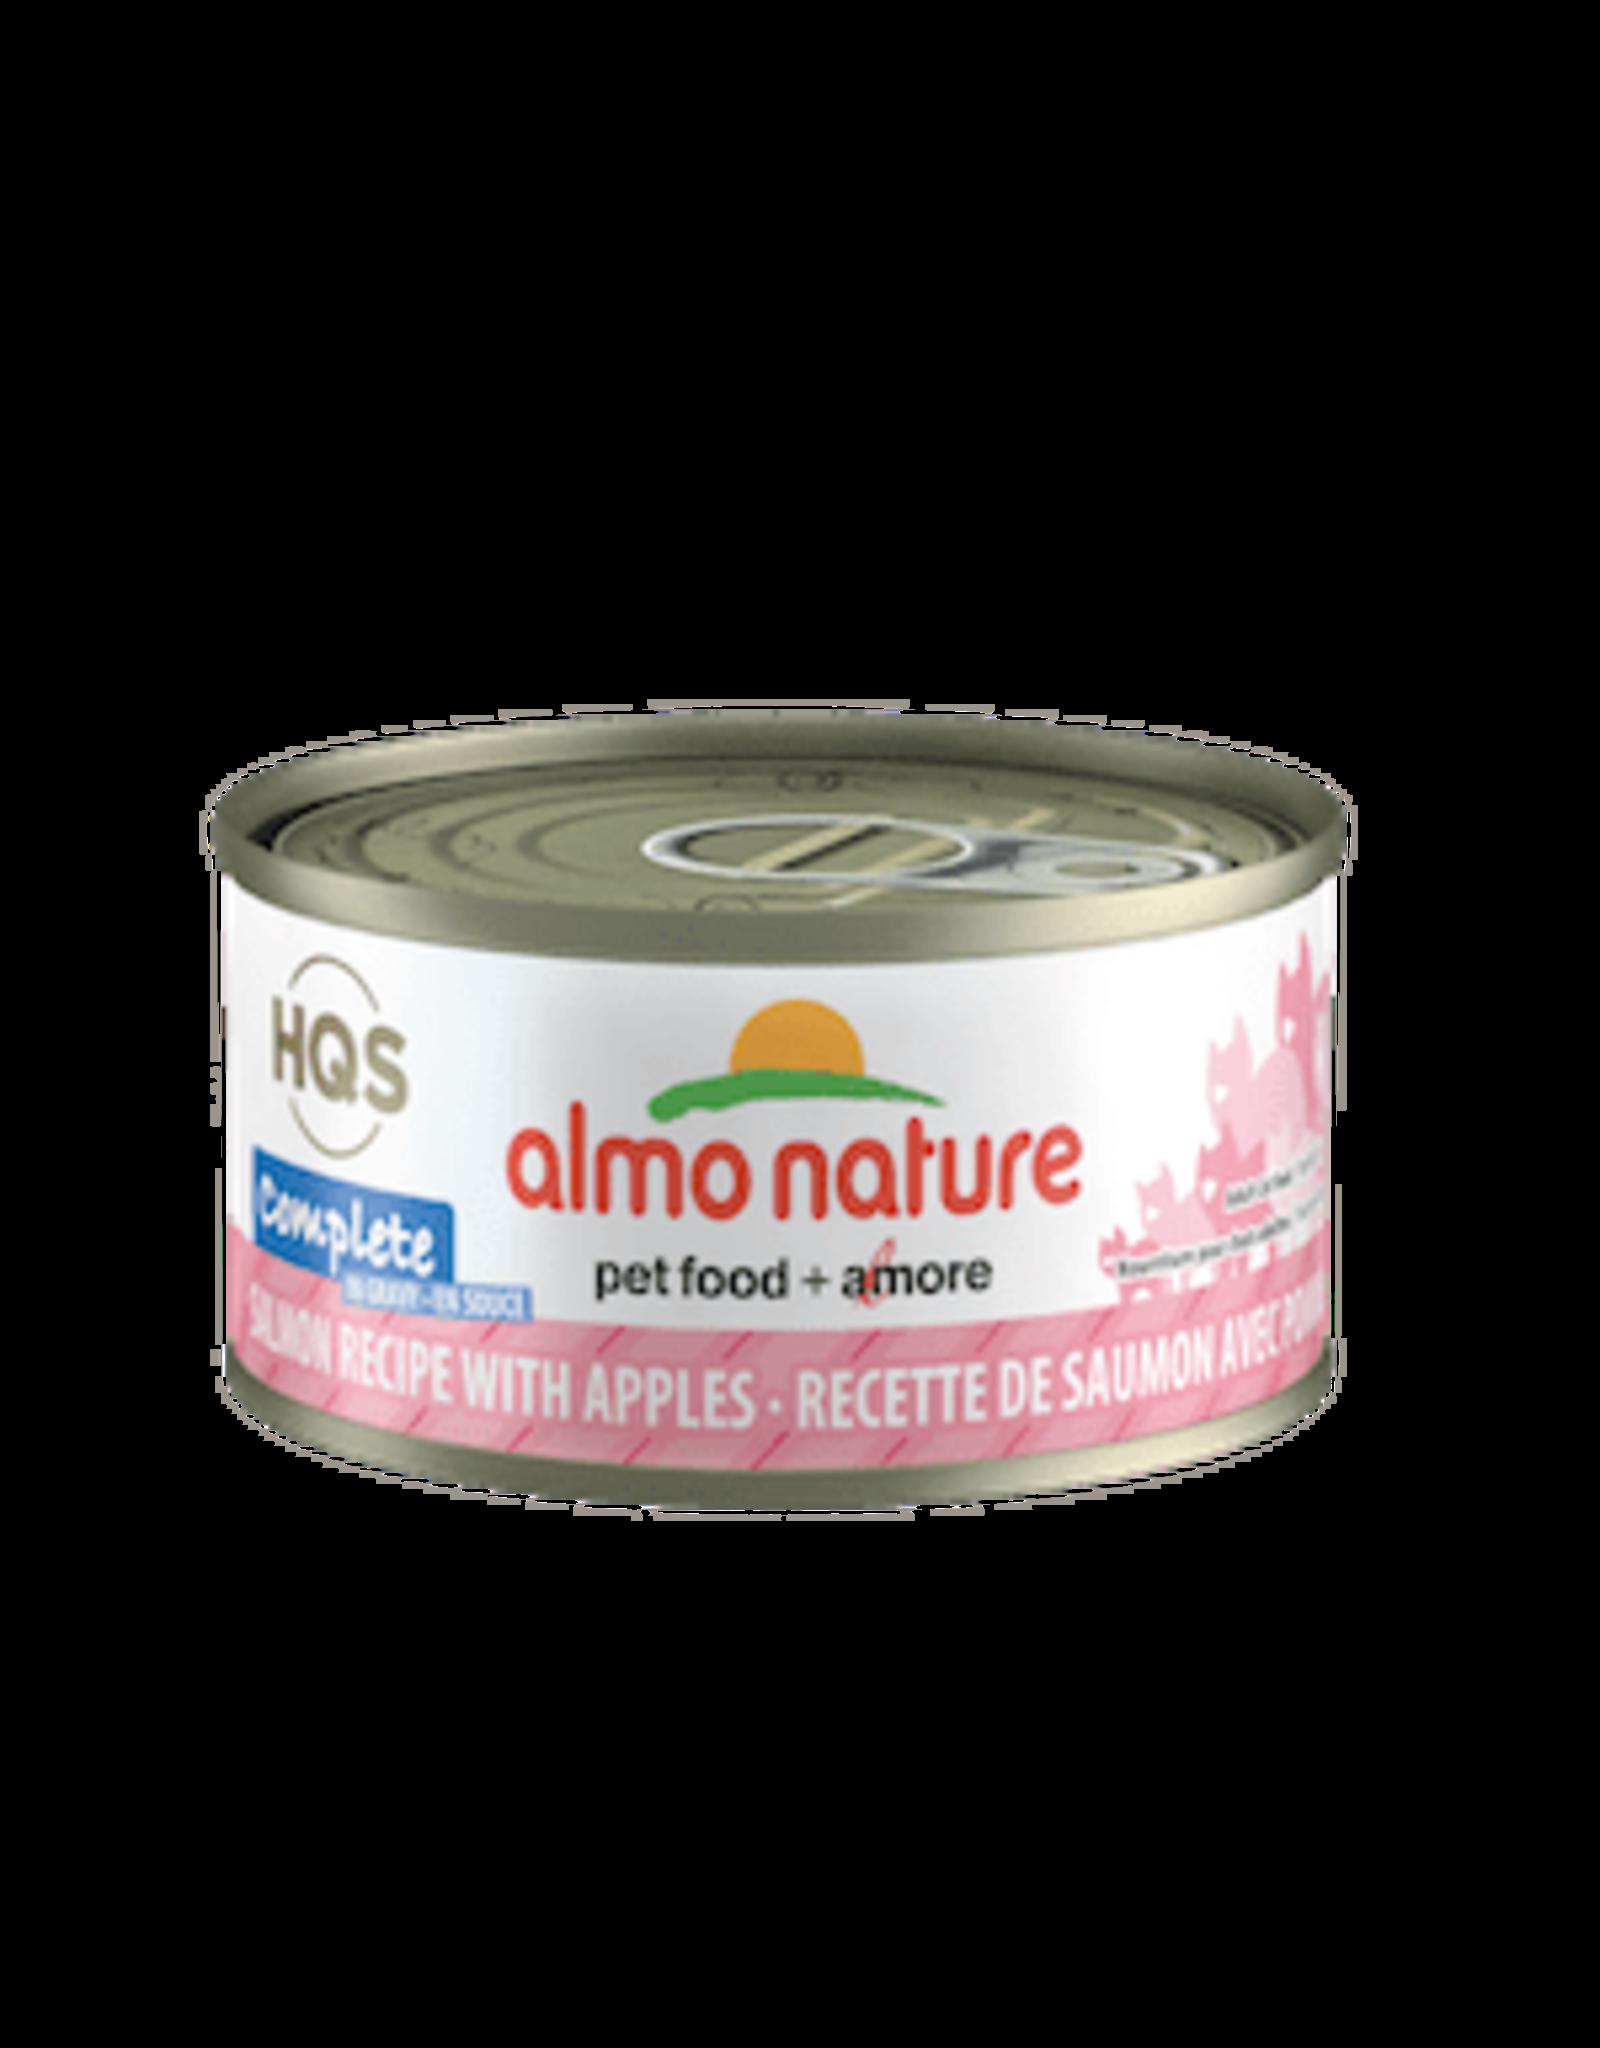 Almo Nature Almo Nature HQS Complete Salmon & Apple in Gravy Cat Food 2.47oz